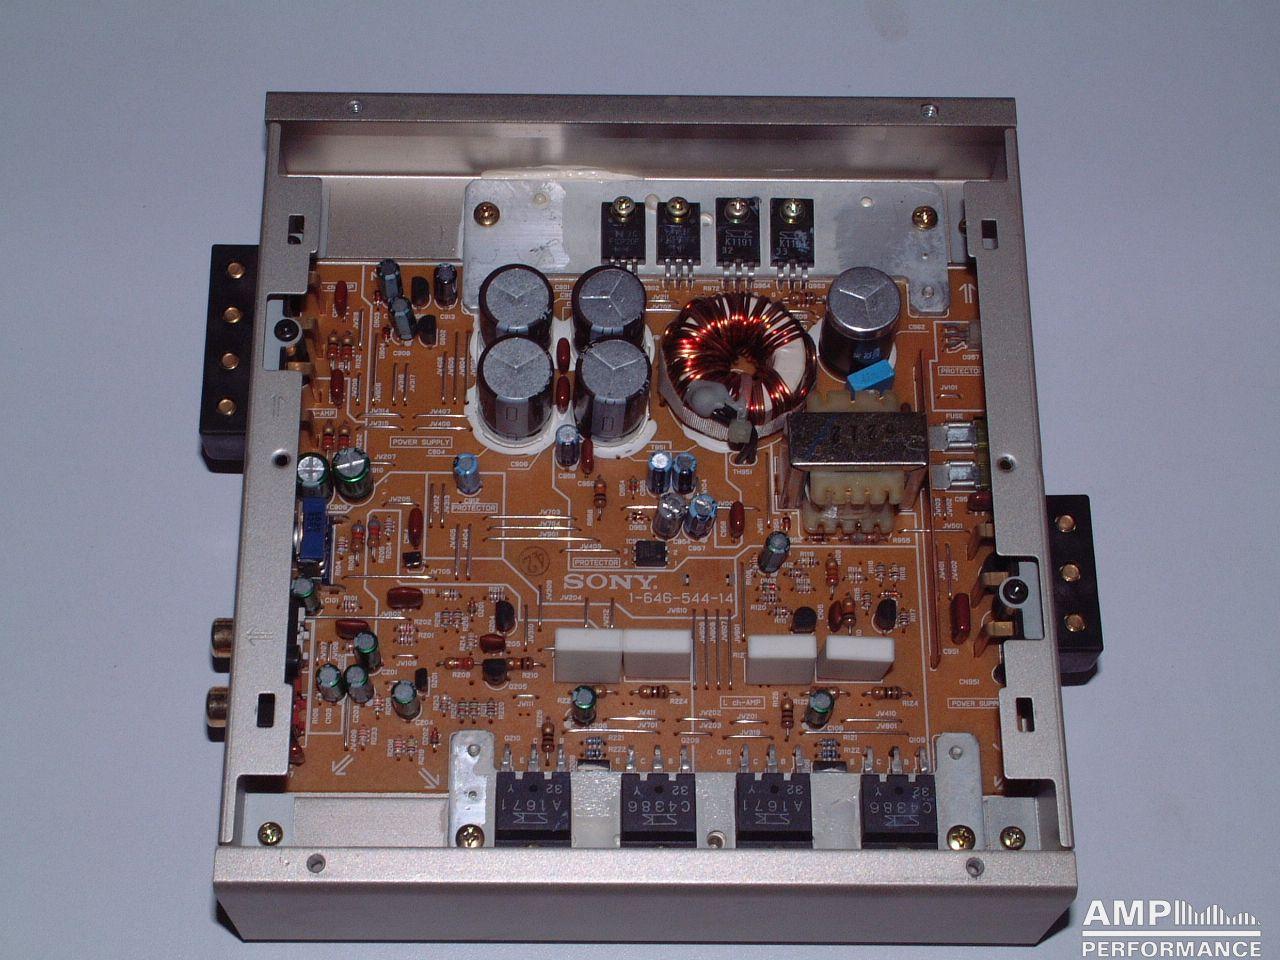 Sony Xm 4520 Amp Performance Amplifier Schematic Diagram Xm 4520